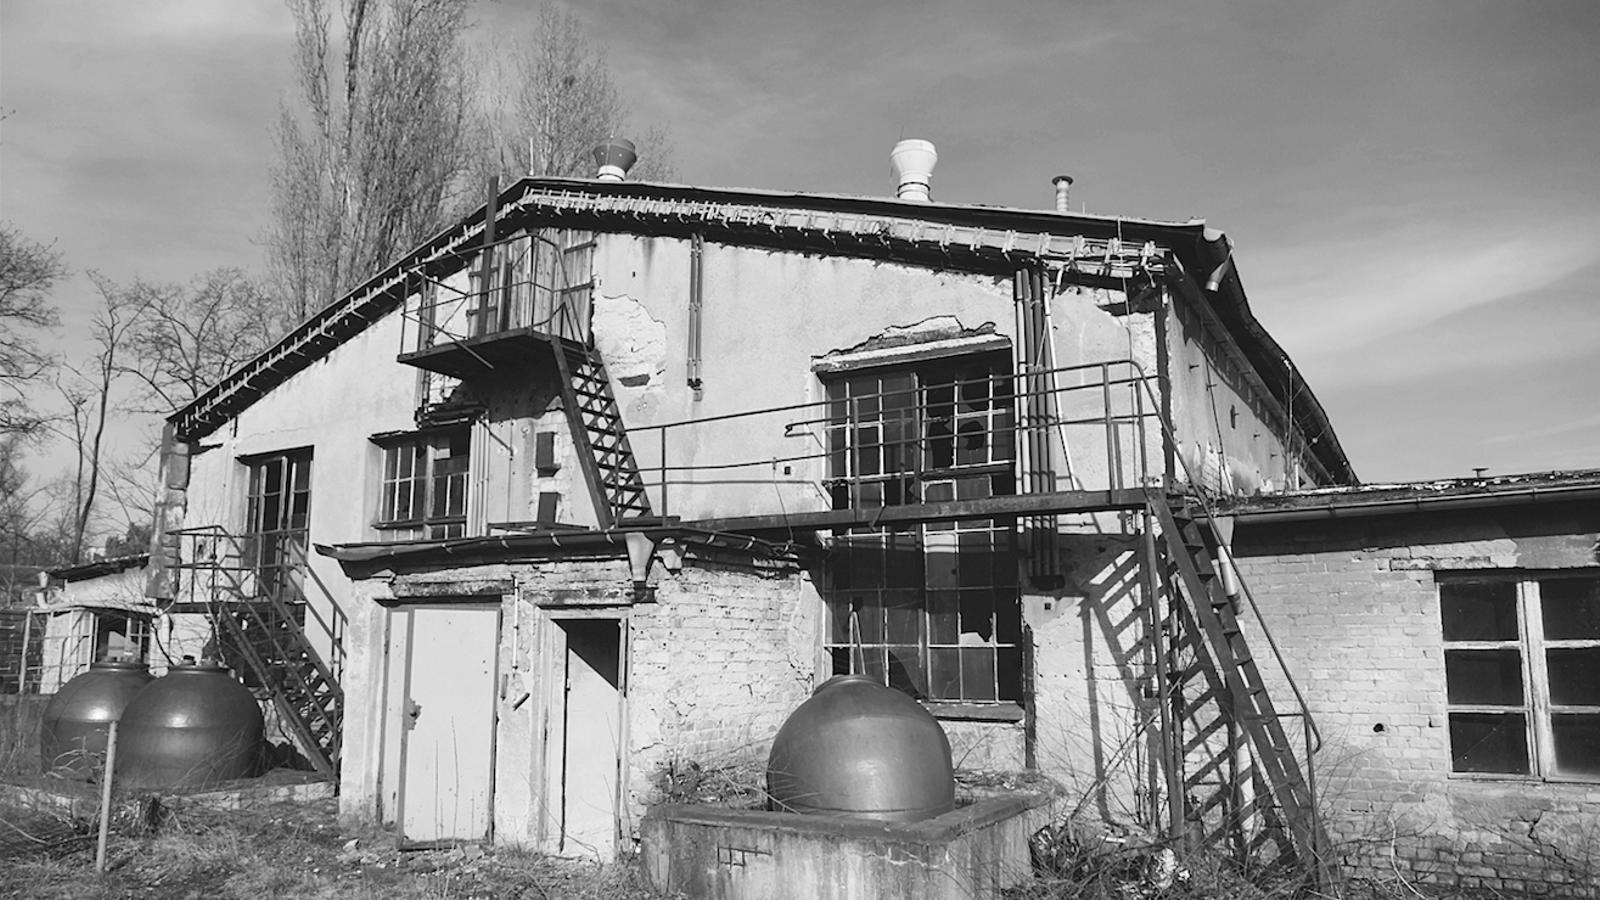 Els laboratoris Temmler a Berlín-Johannisthal avui